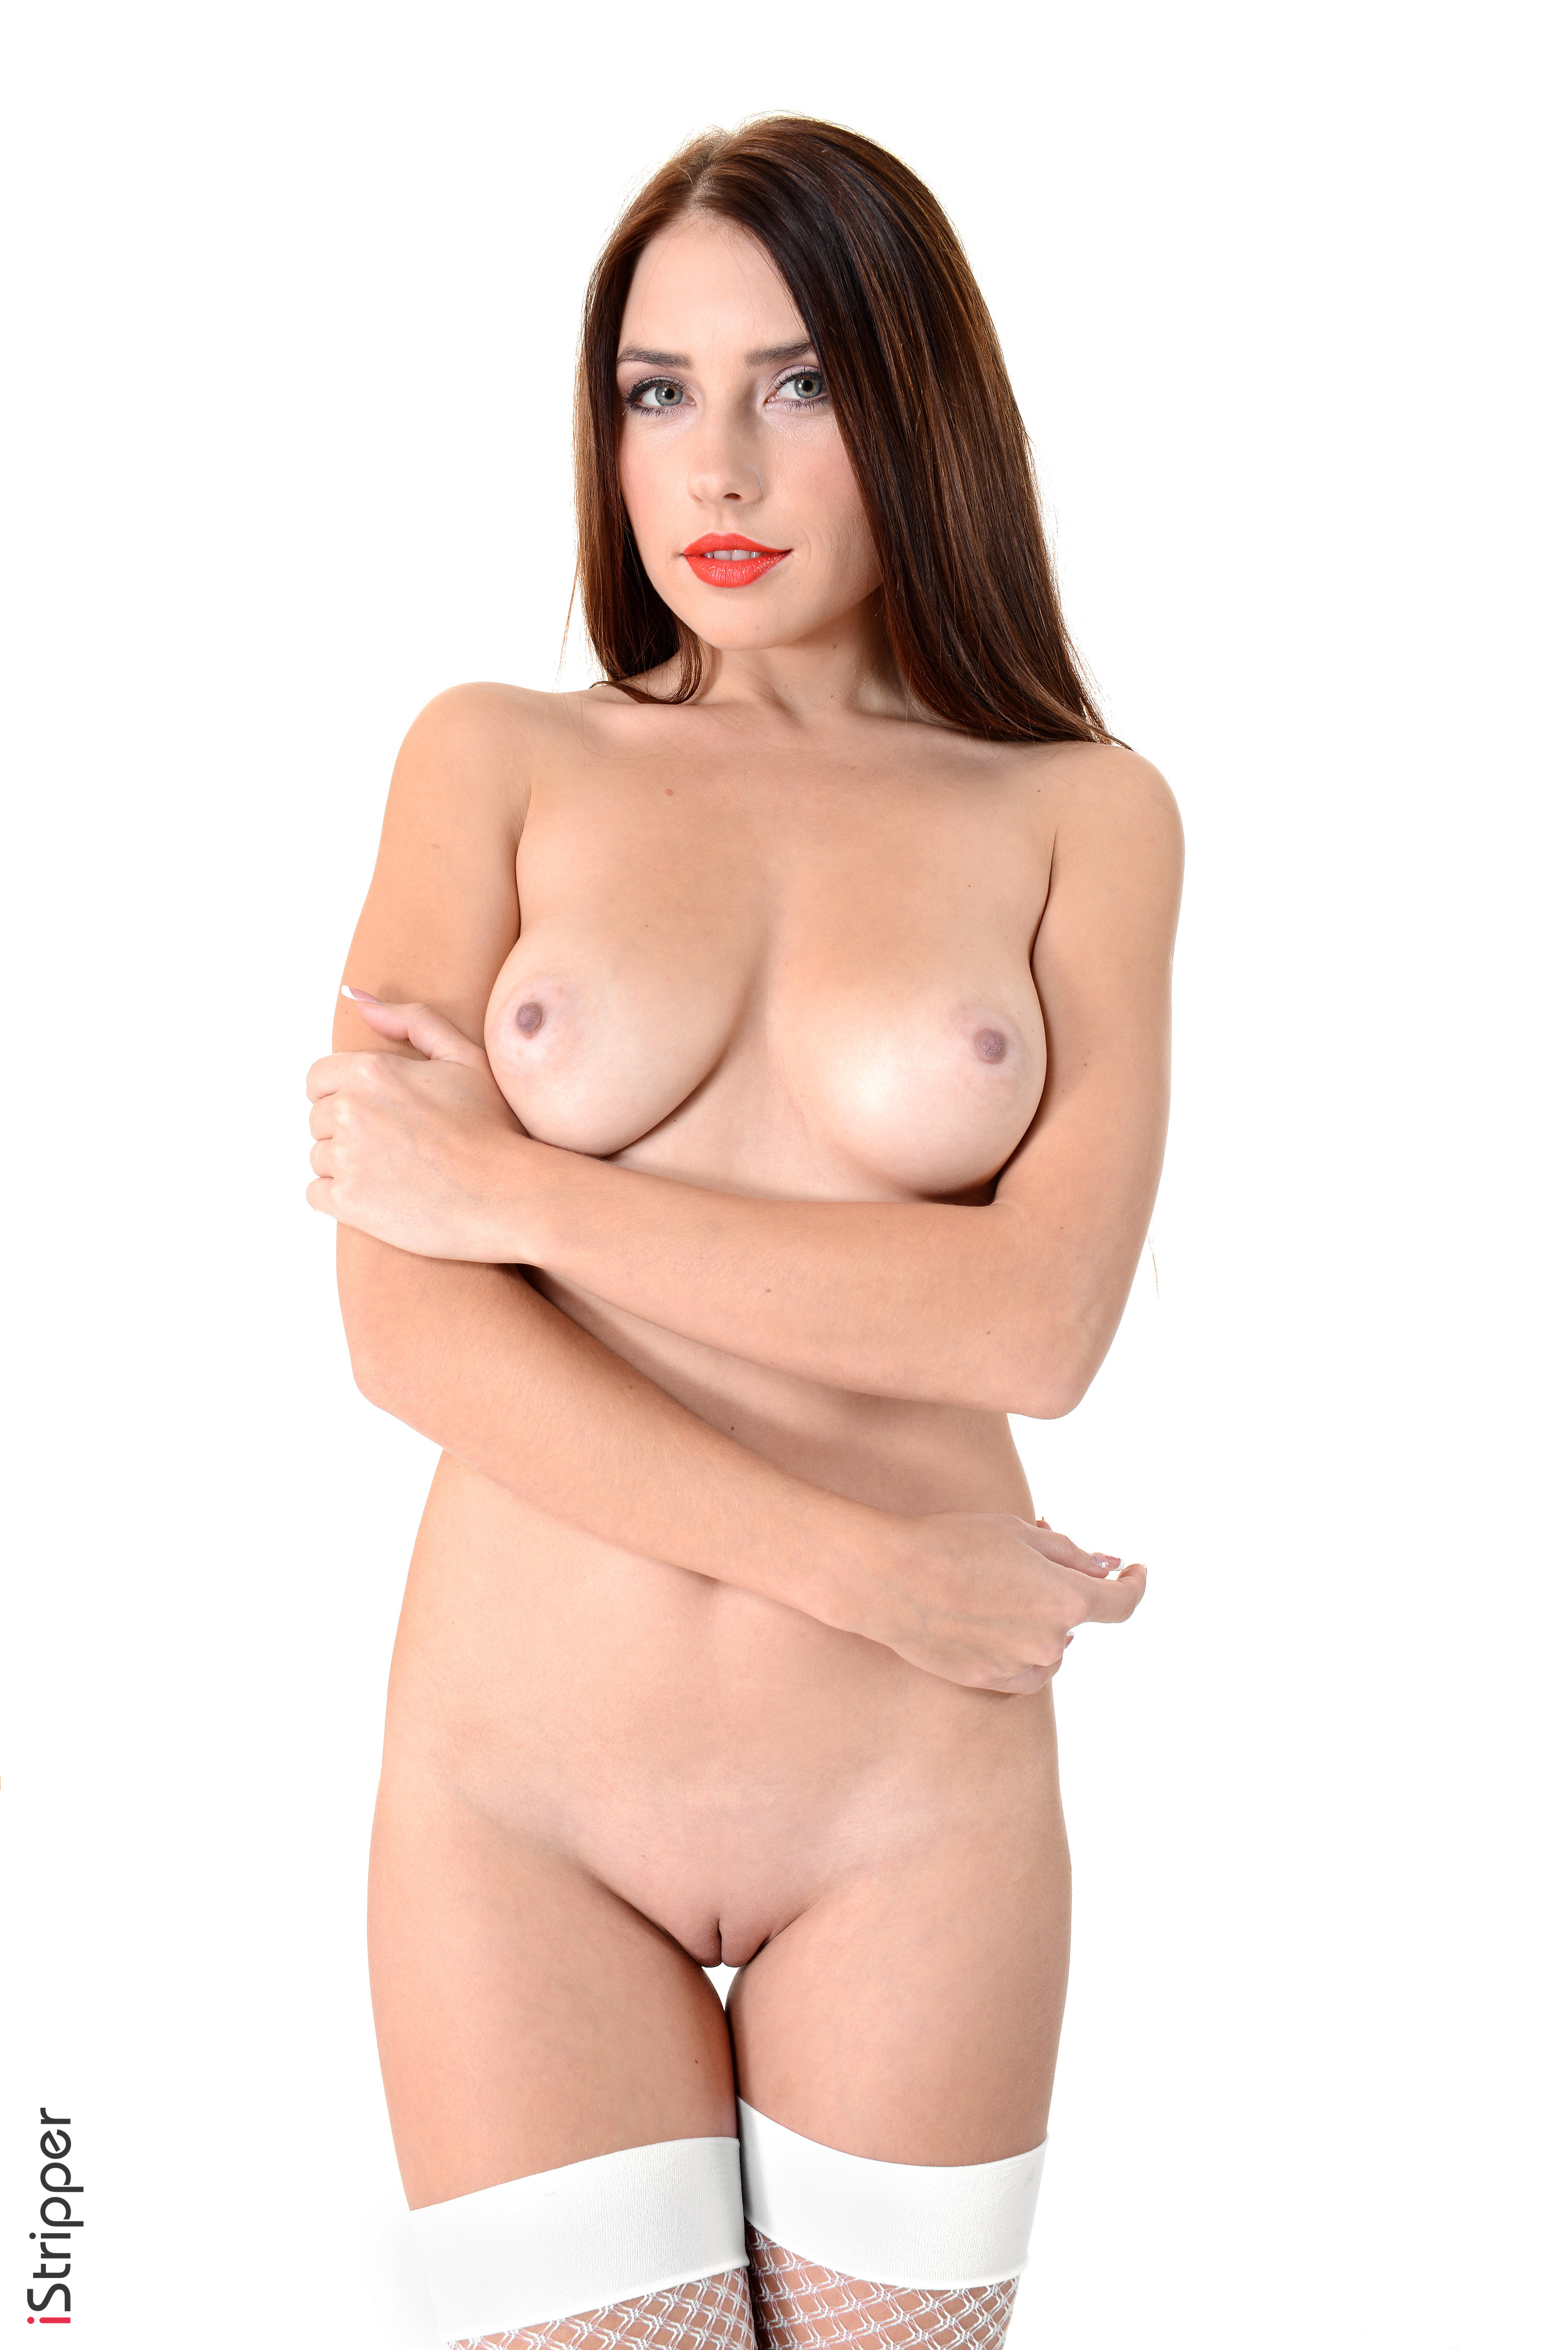 virtual girl desktop strippers a scam